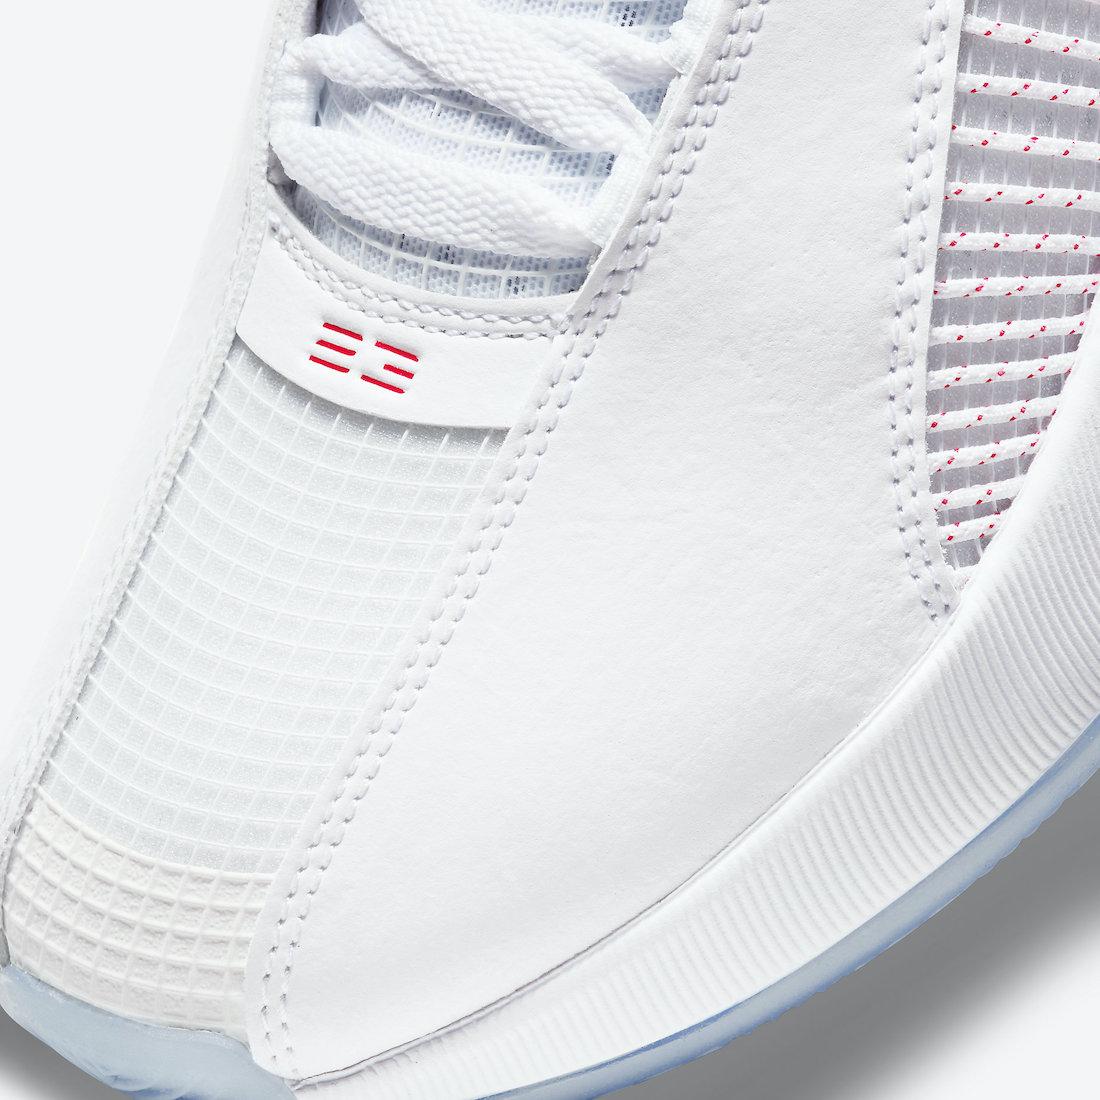 "Air Jordan 35,Jordan Brand,CQ4 将于近日发售 致敬流川枫配色!Air Jordan 35 ""Fire Red"" 官图释出!"